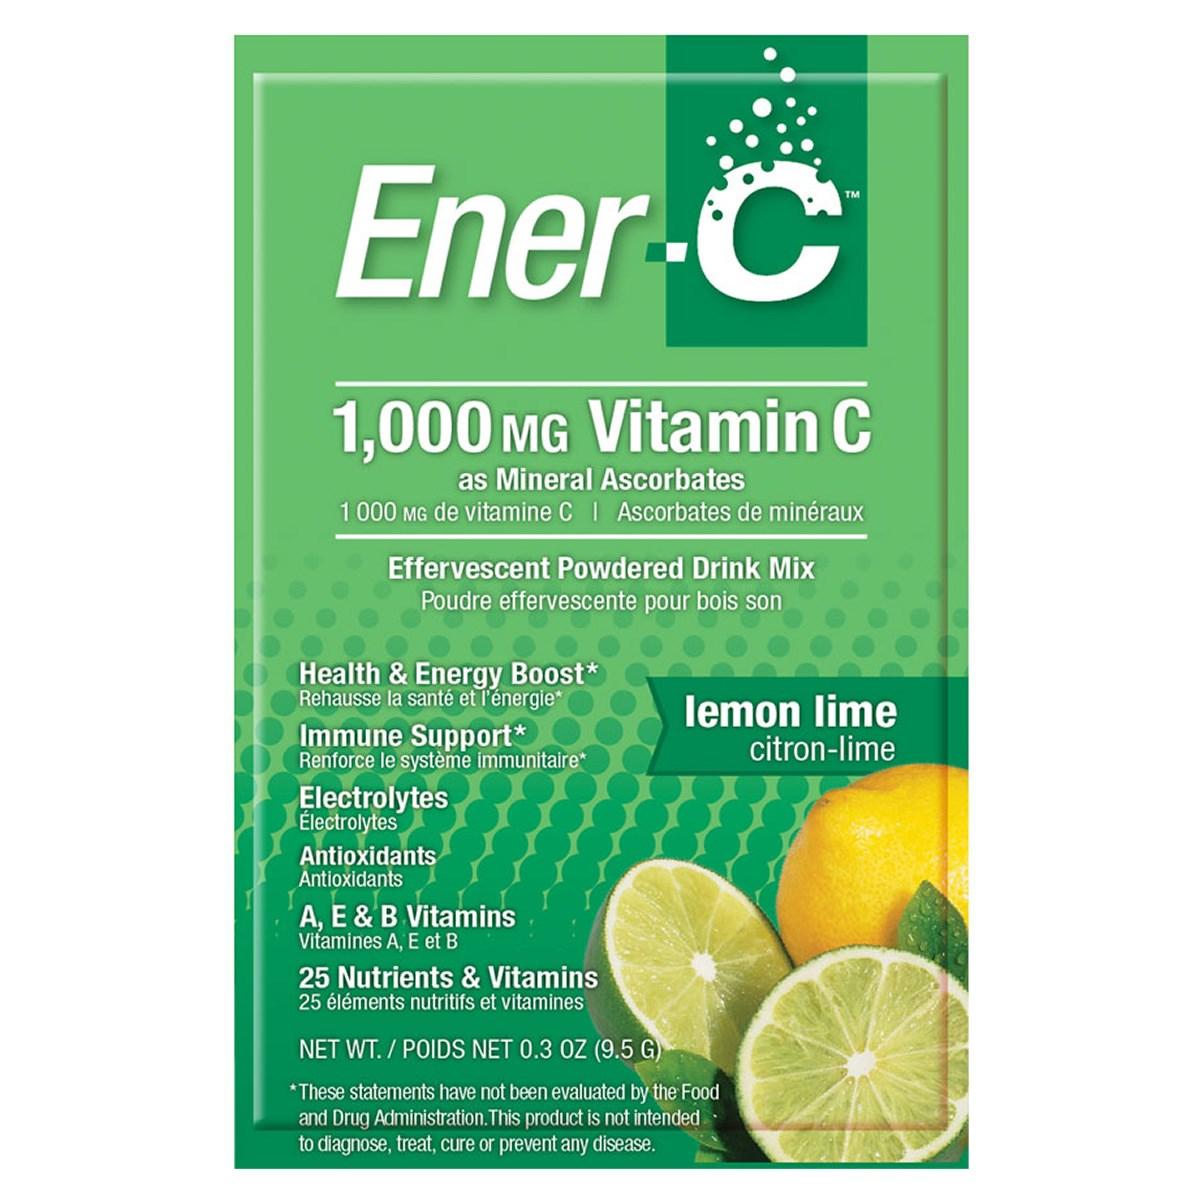 Ener-C 1000mg Vitamin C - Lemon Lime